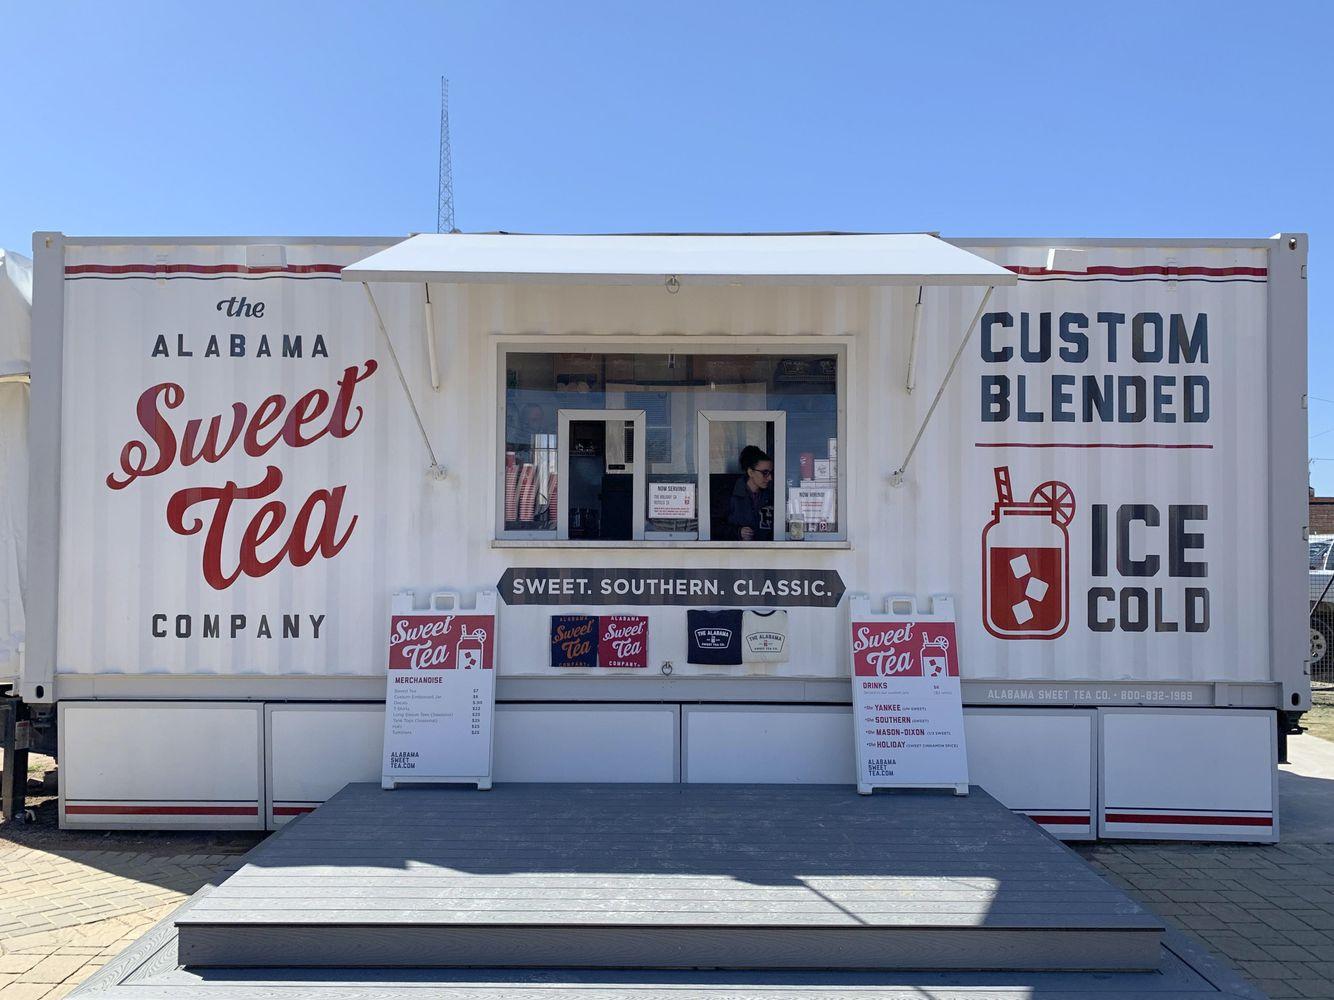 Alabama Sweet Tea Company Food Truck at Magnolia Market